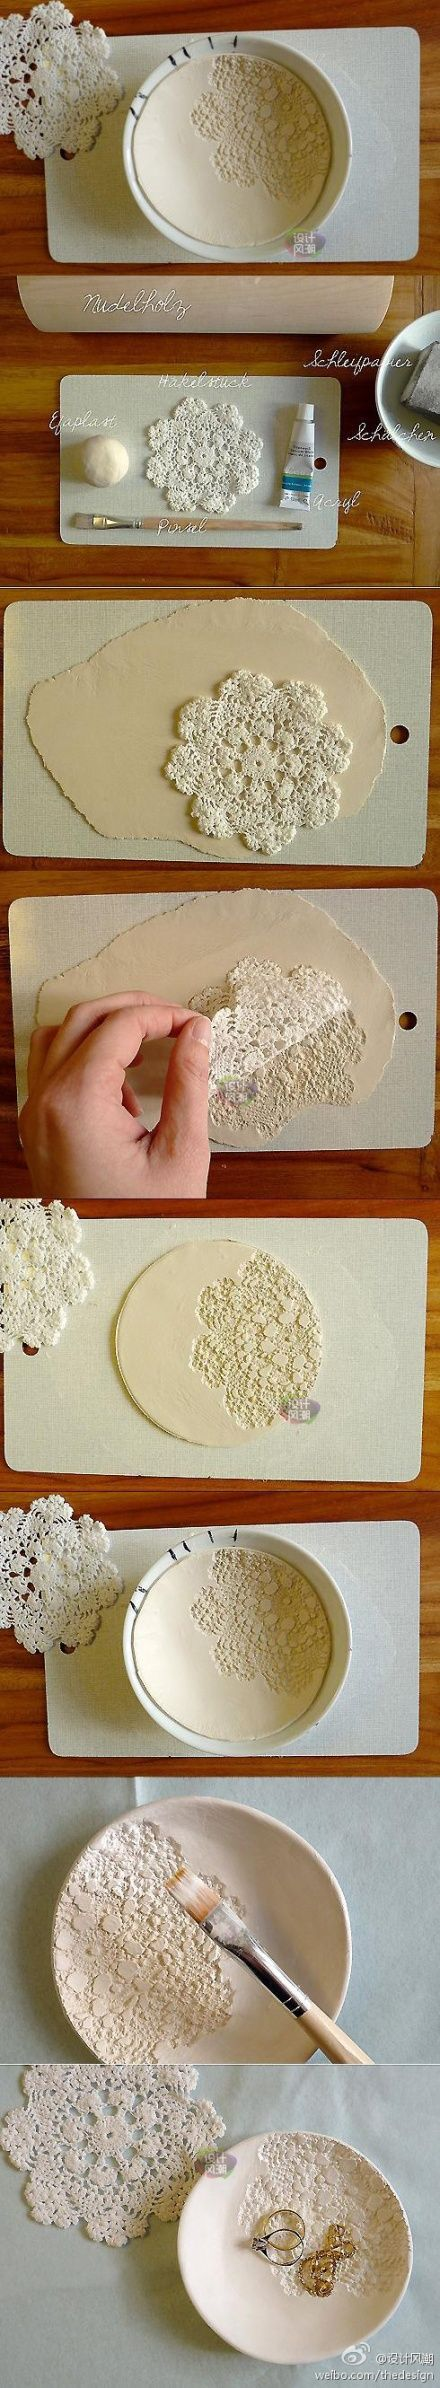 DIY air dry clay bowl using lace ~ pretty!